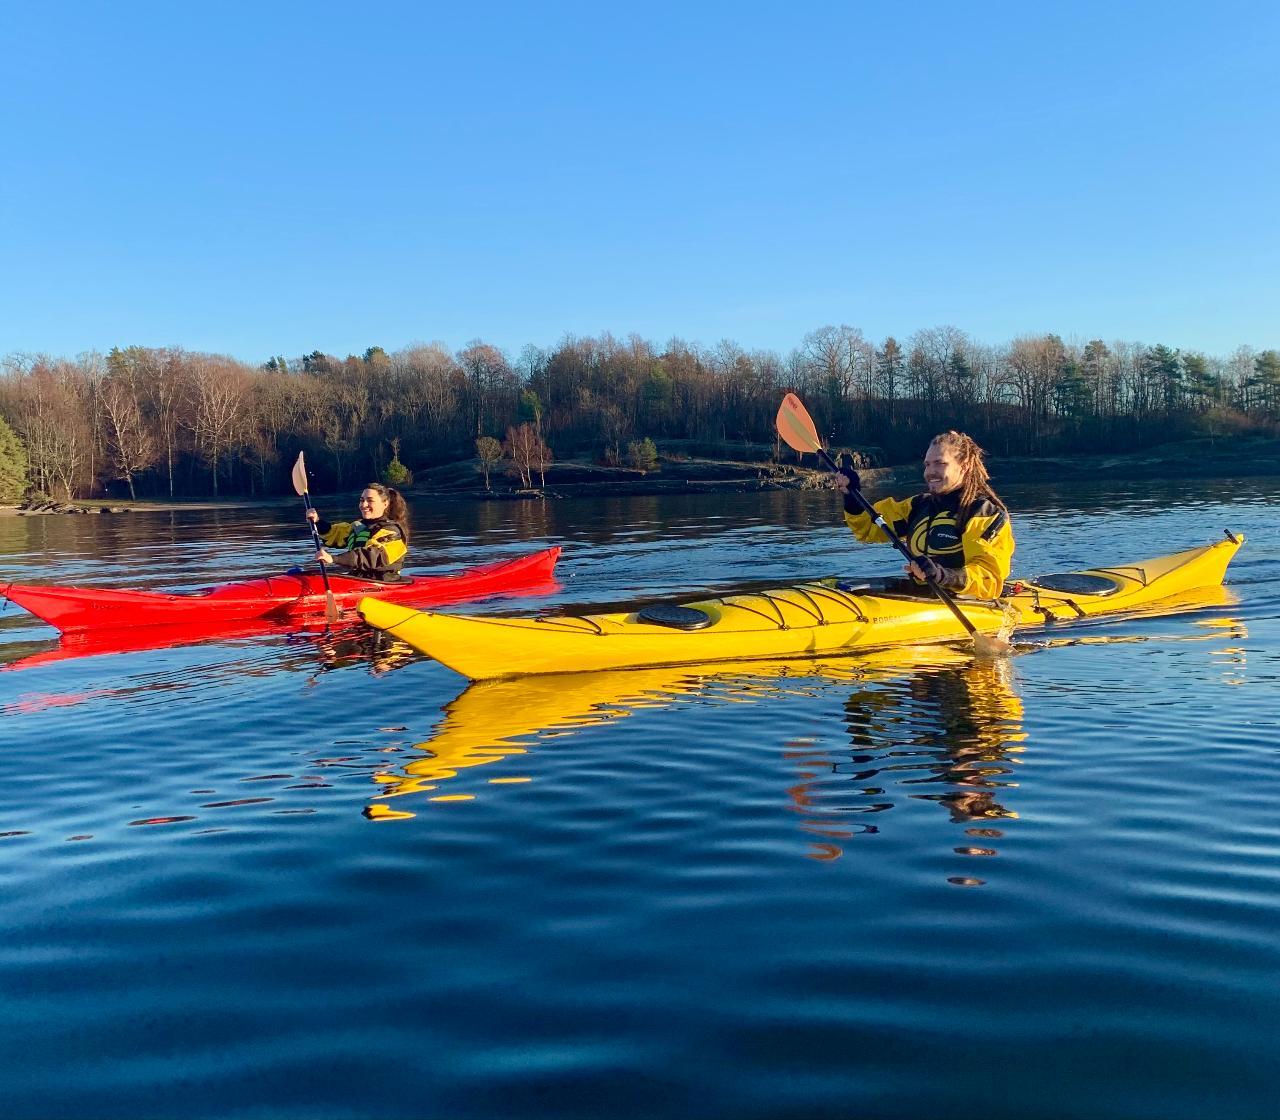 Winter Kayak Tour - Private Group